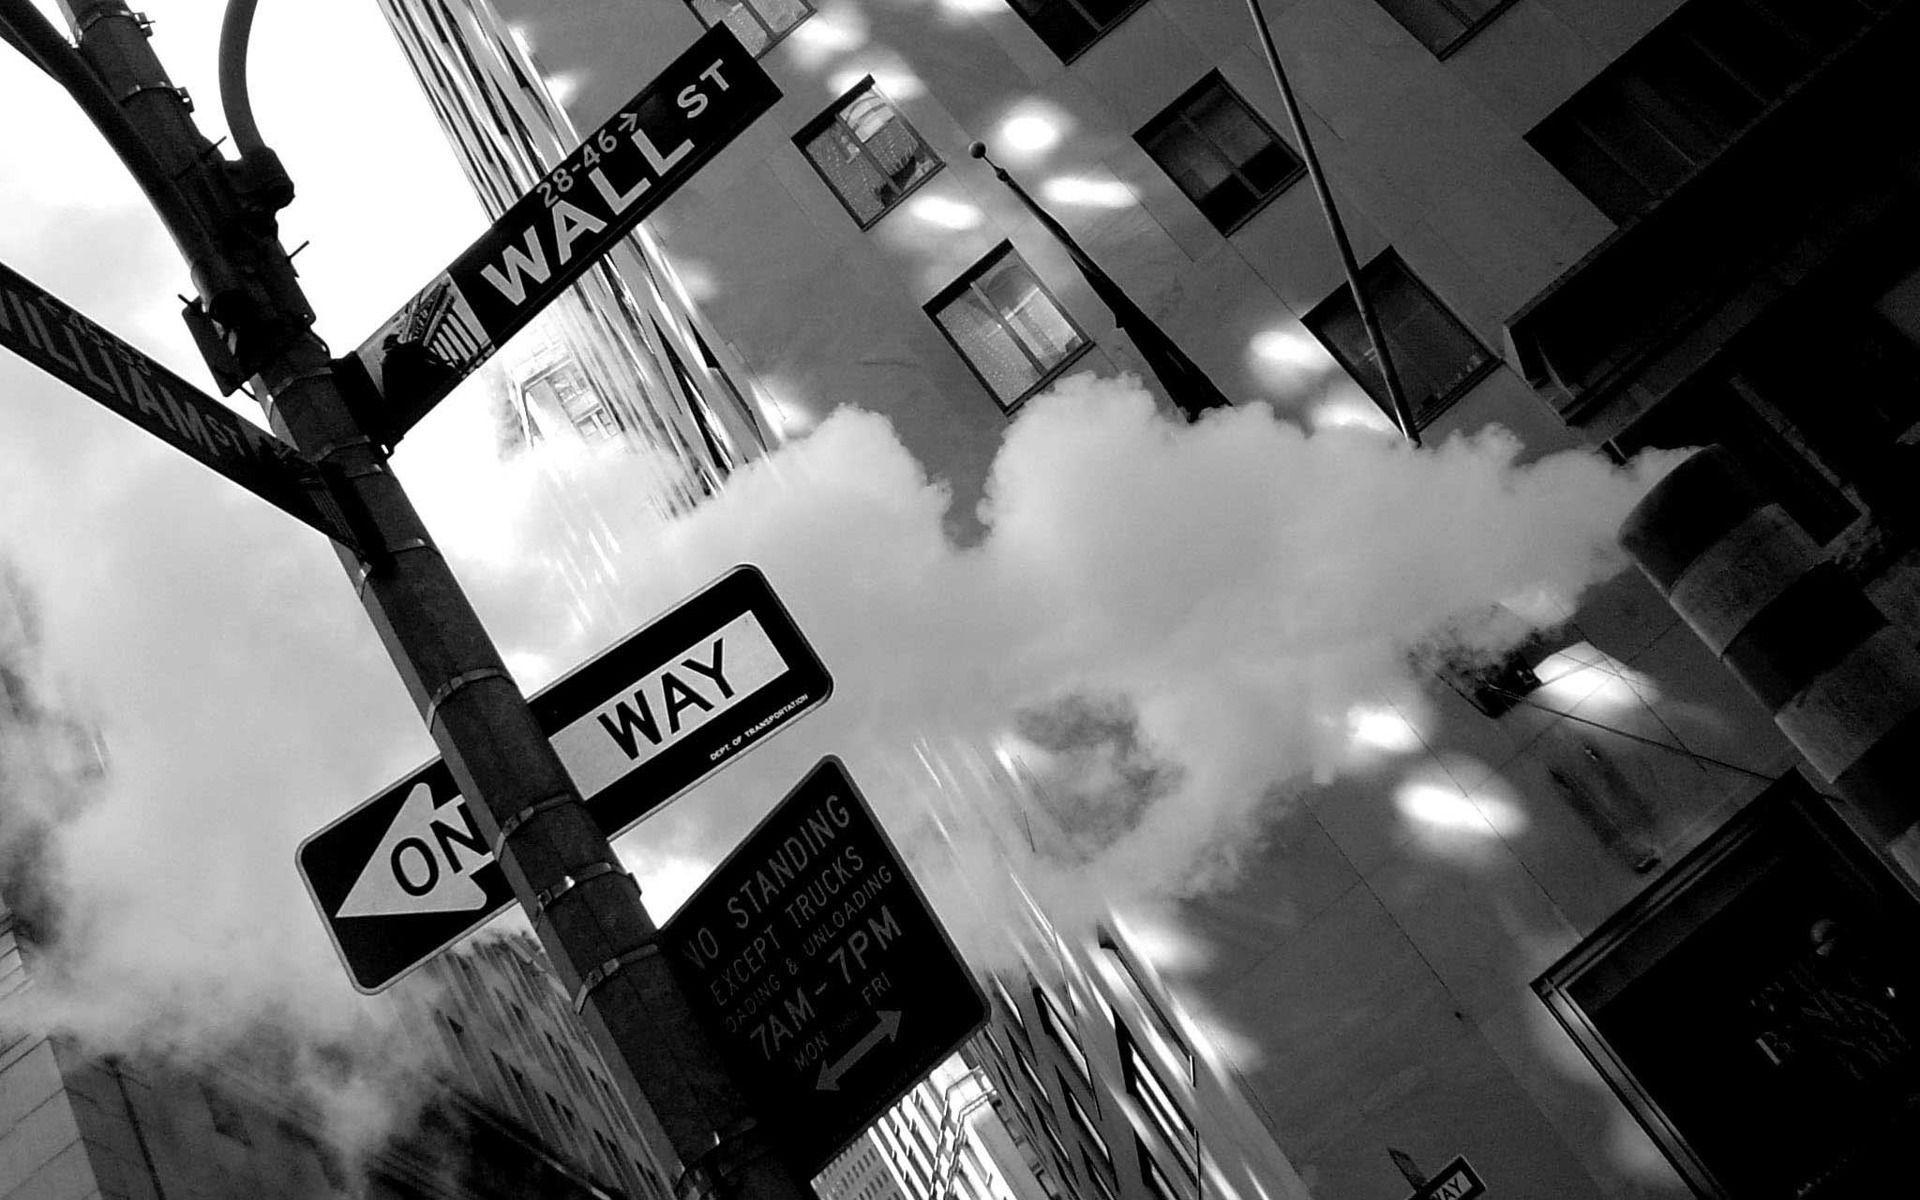 Image Photo Photographie Image En Noir Et Blanc La Ville New York New York Ville Manhattan Wall Street La Rue Uo Wall Street Black And White Street